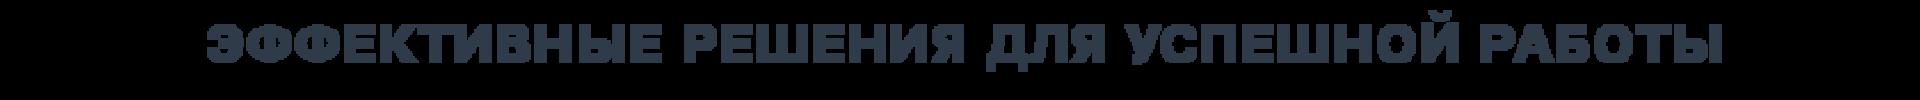 https://kampas.ru/wp-content/uploads/2020/05/effectresh-1920x100.png